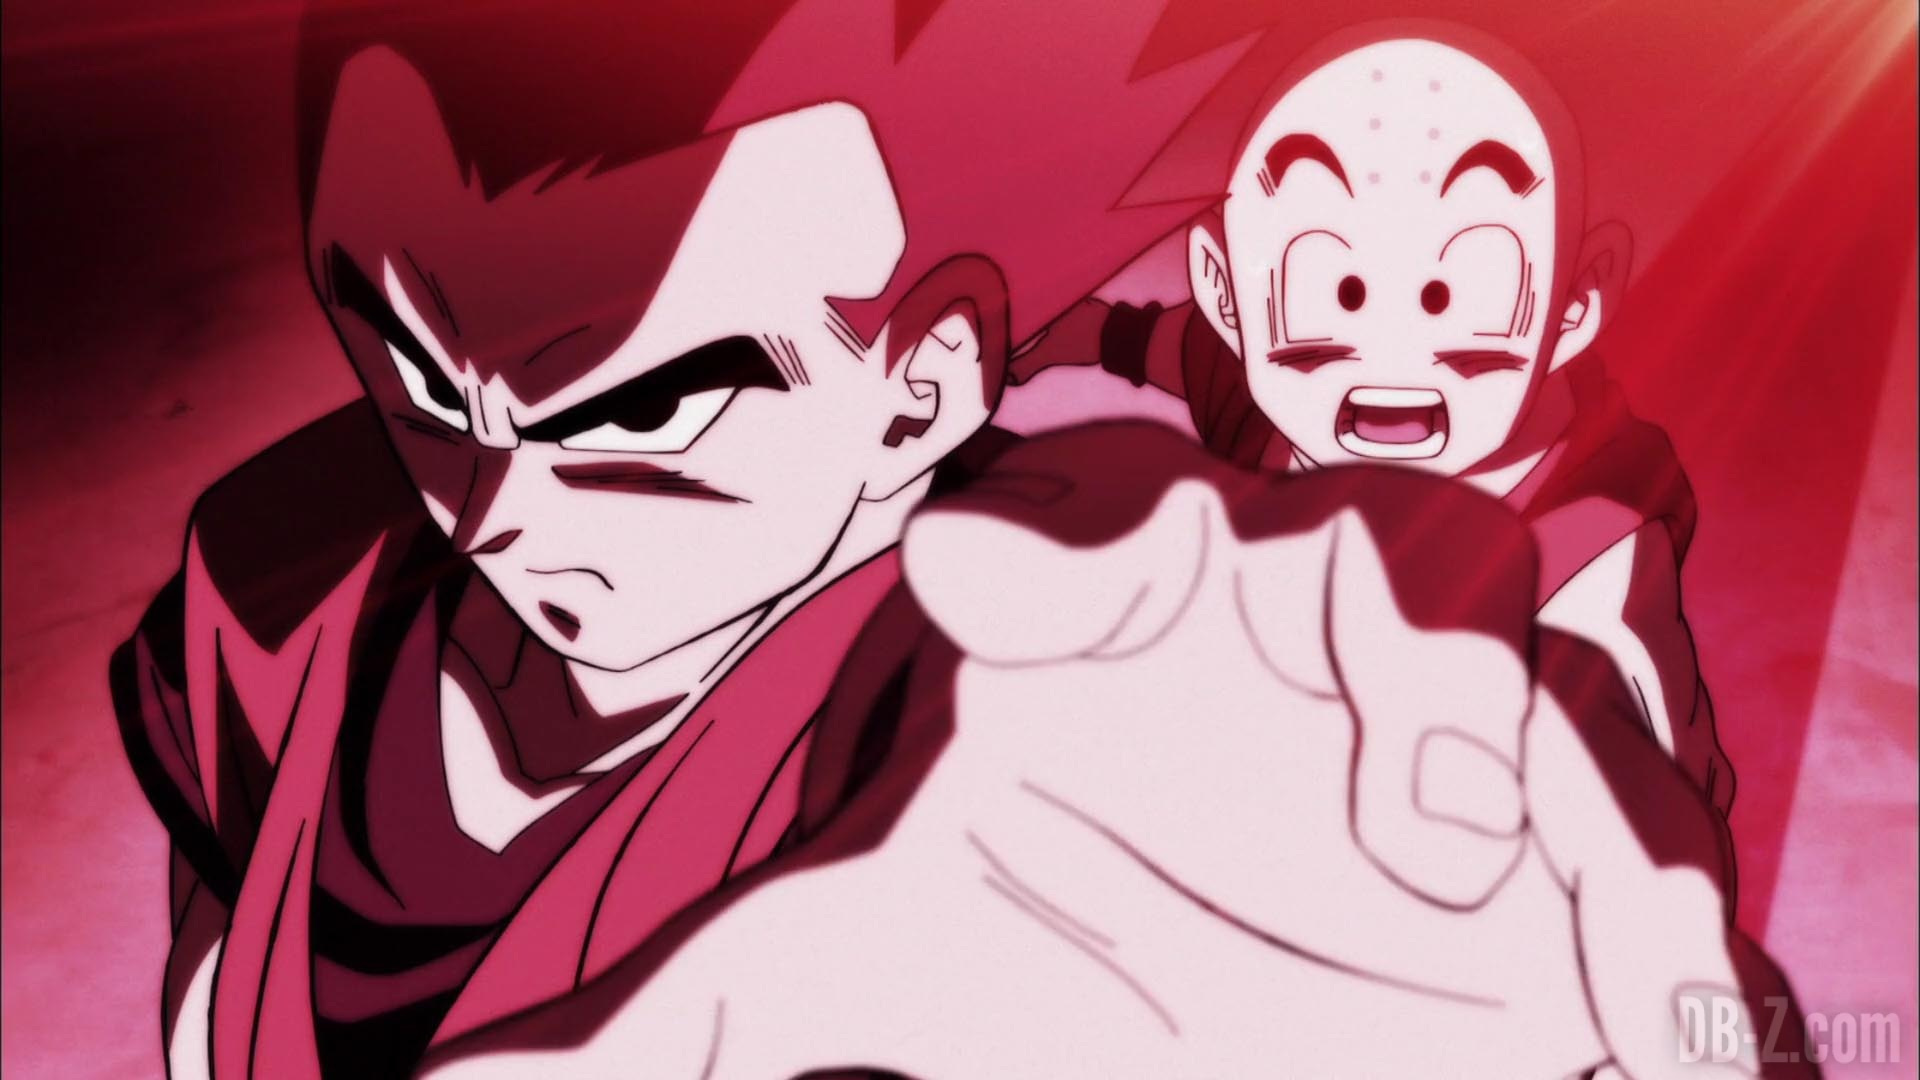 Dragon-Ball-Super-Episode-99-39-Krilin-G